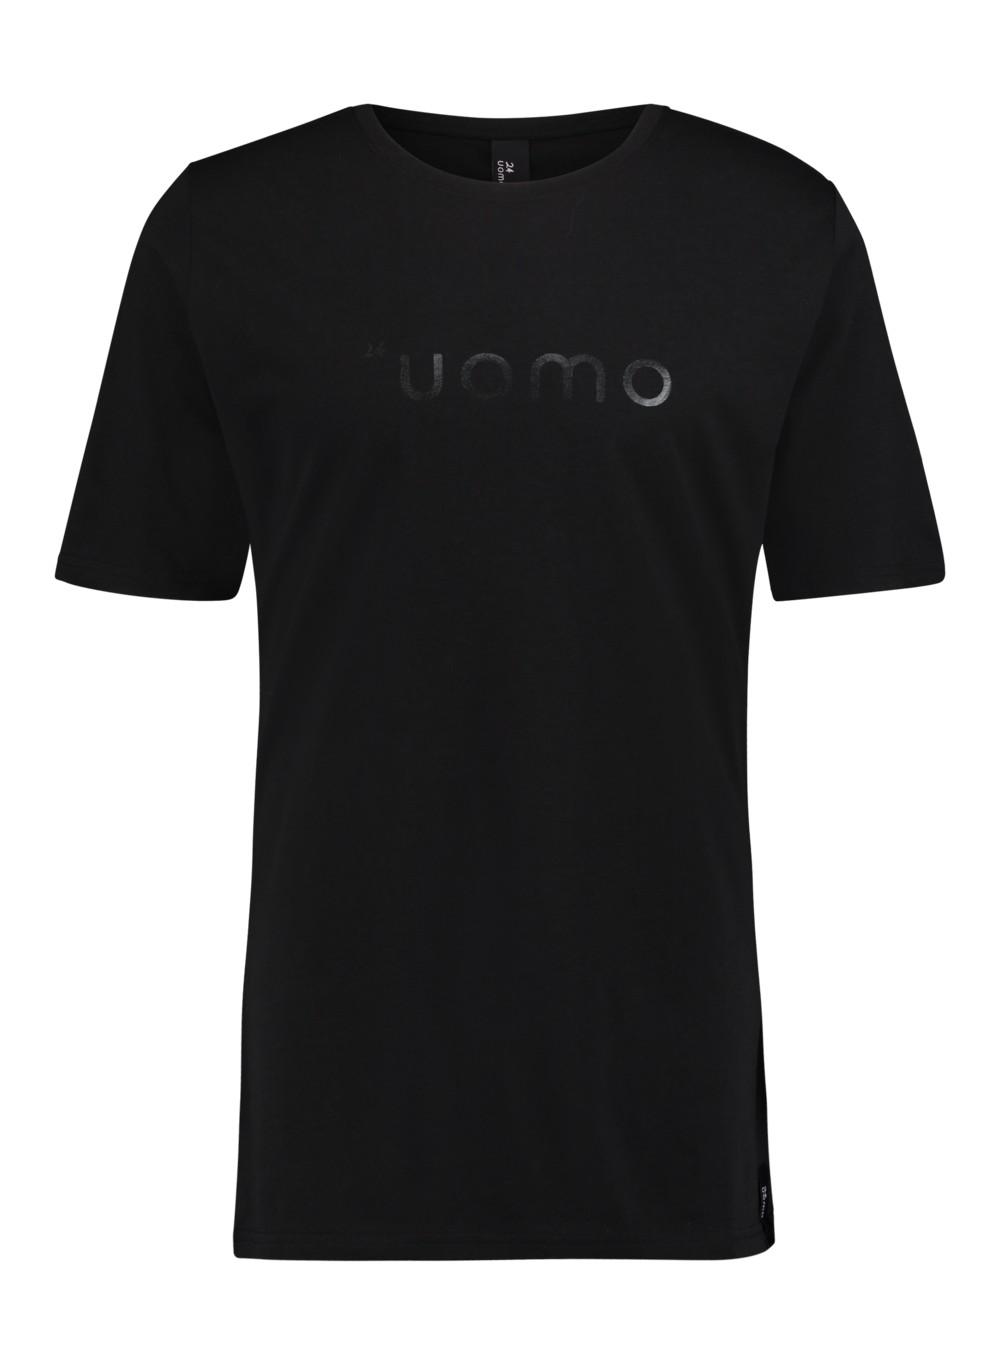 Afbeelding van 24UOMO 24 uomo my6 t-shirt – zwart